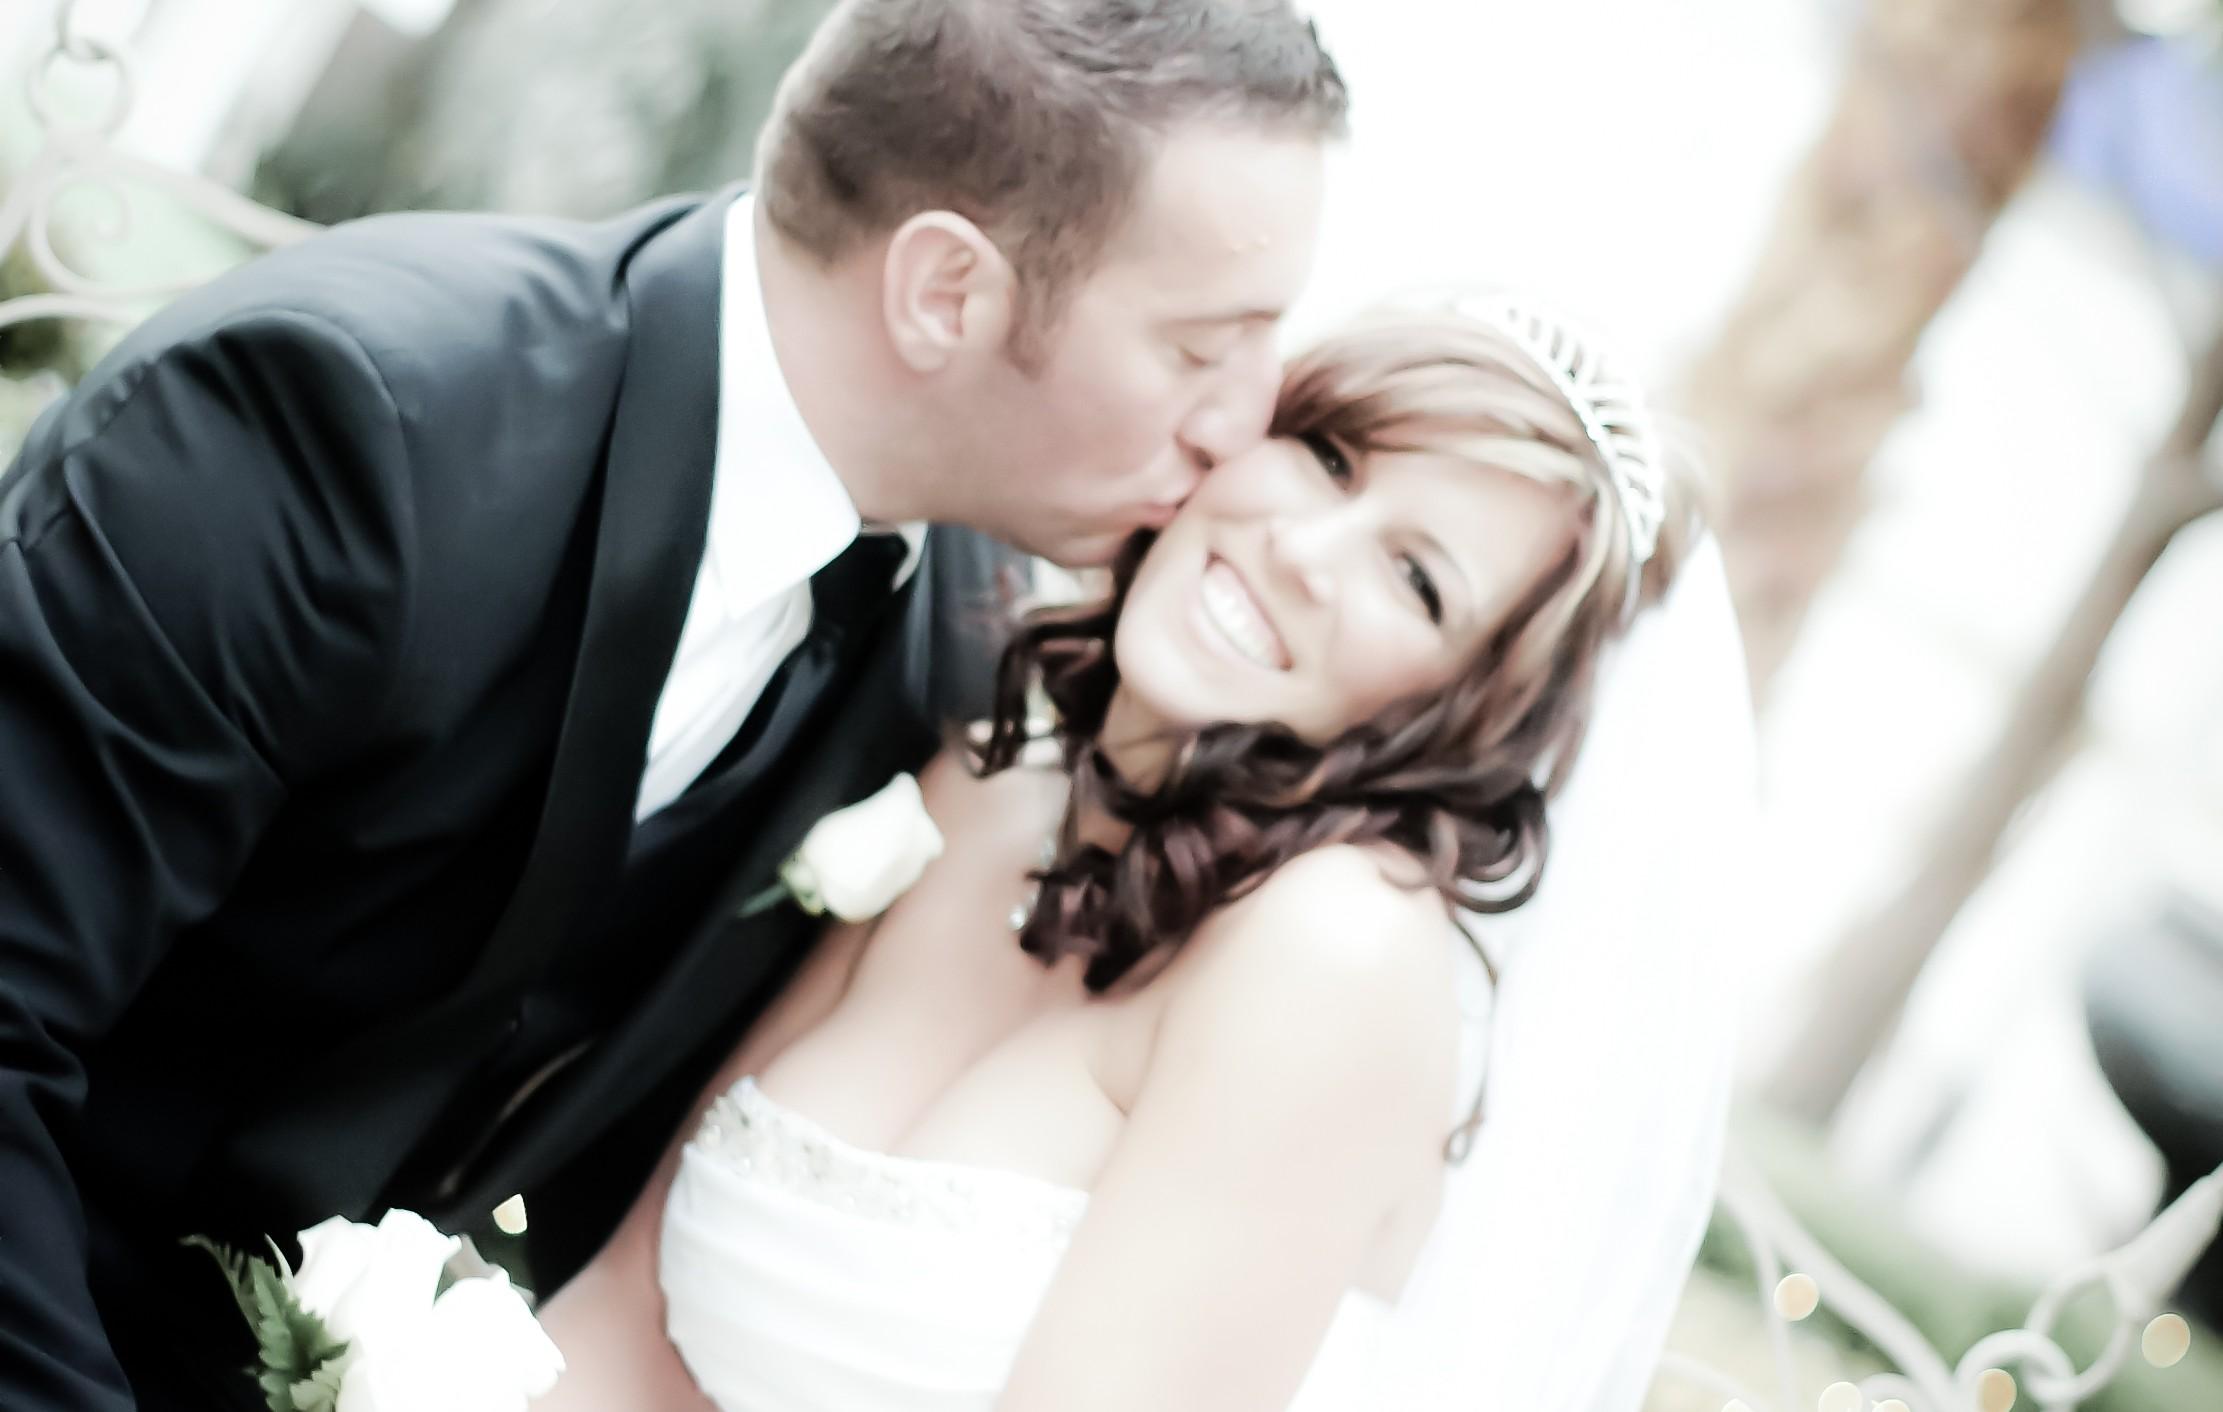 Groom kisses his bride's cheek in the garden at Mon Bel Ami Wedding Chapel in Las Vegas.